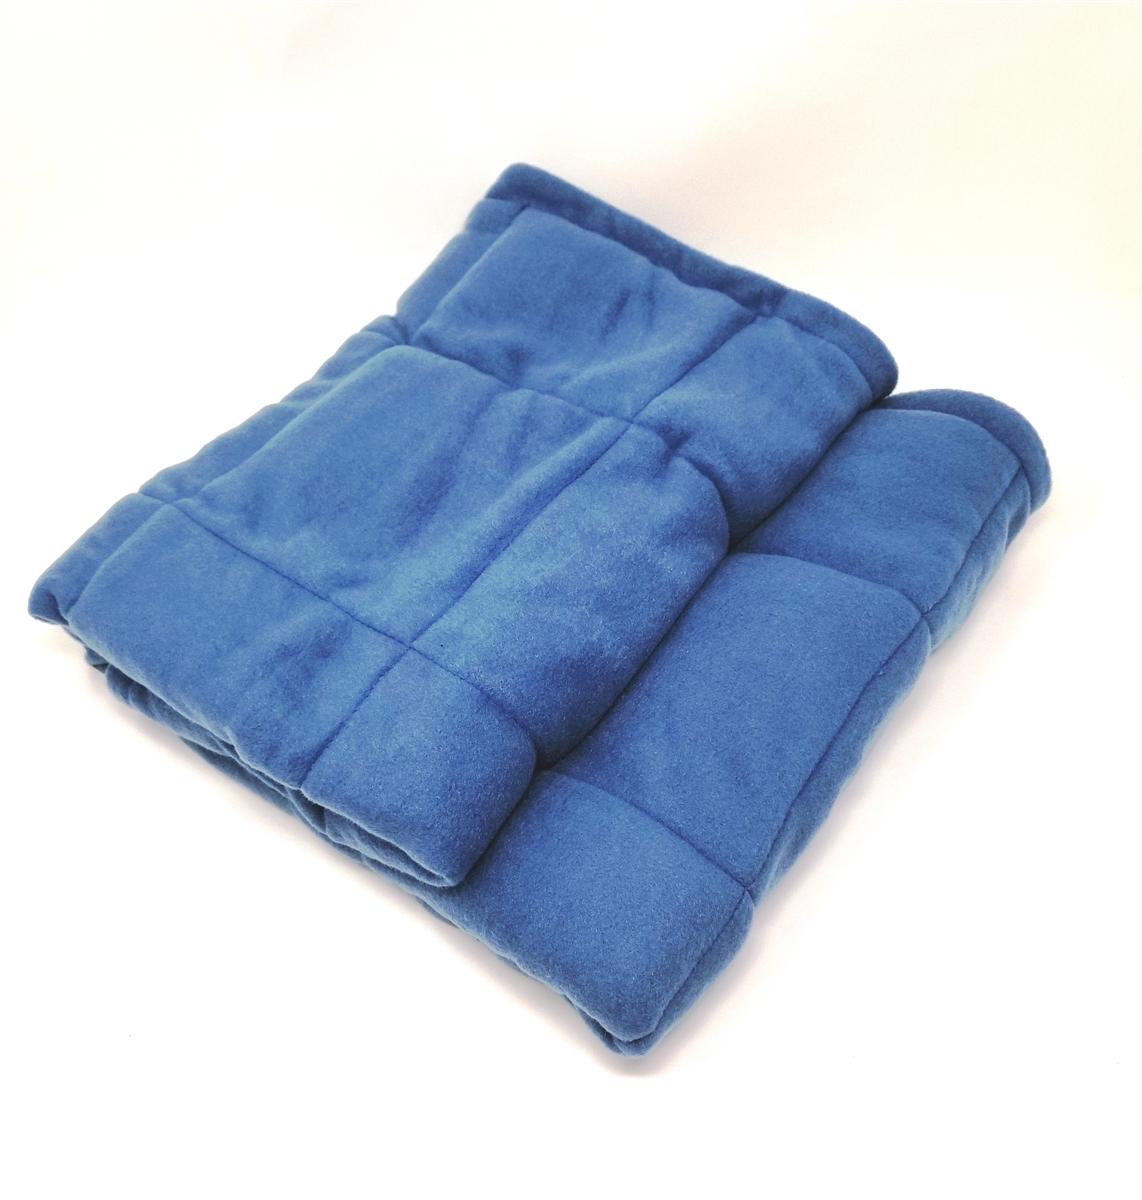 12 lbs Blue Poly Pellets